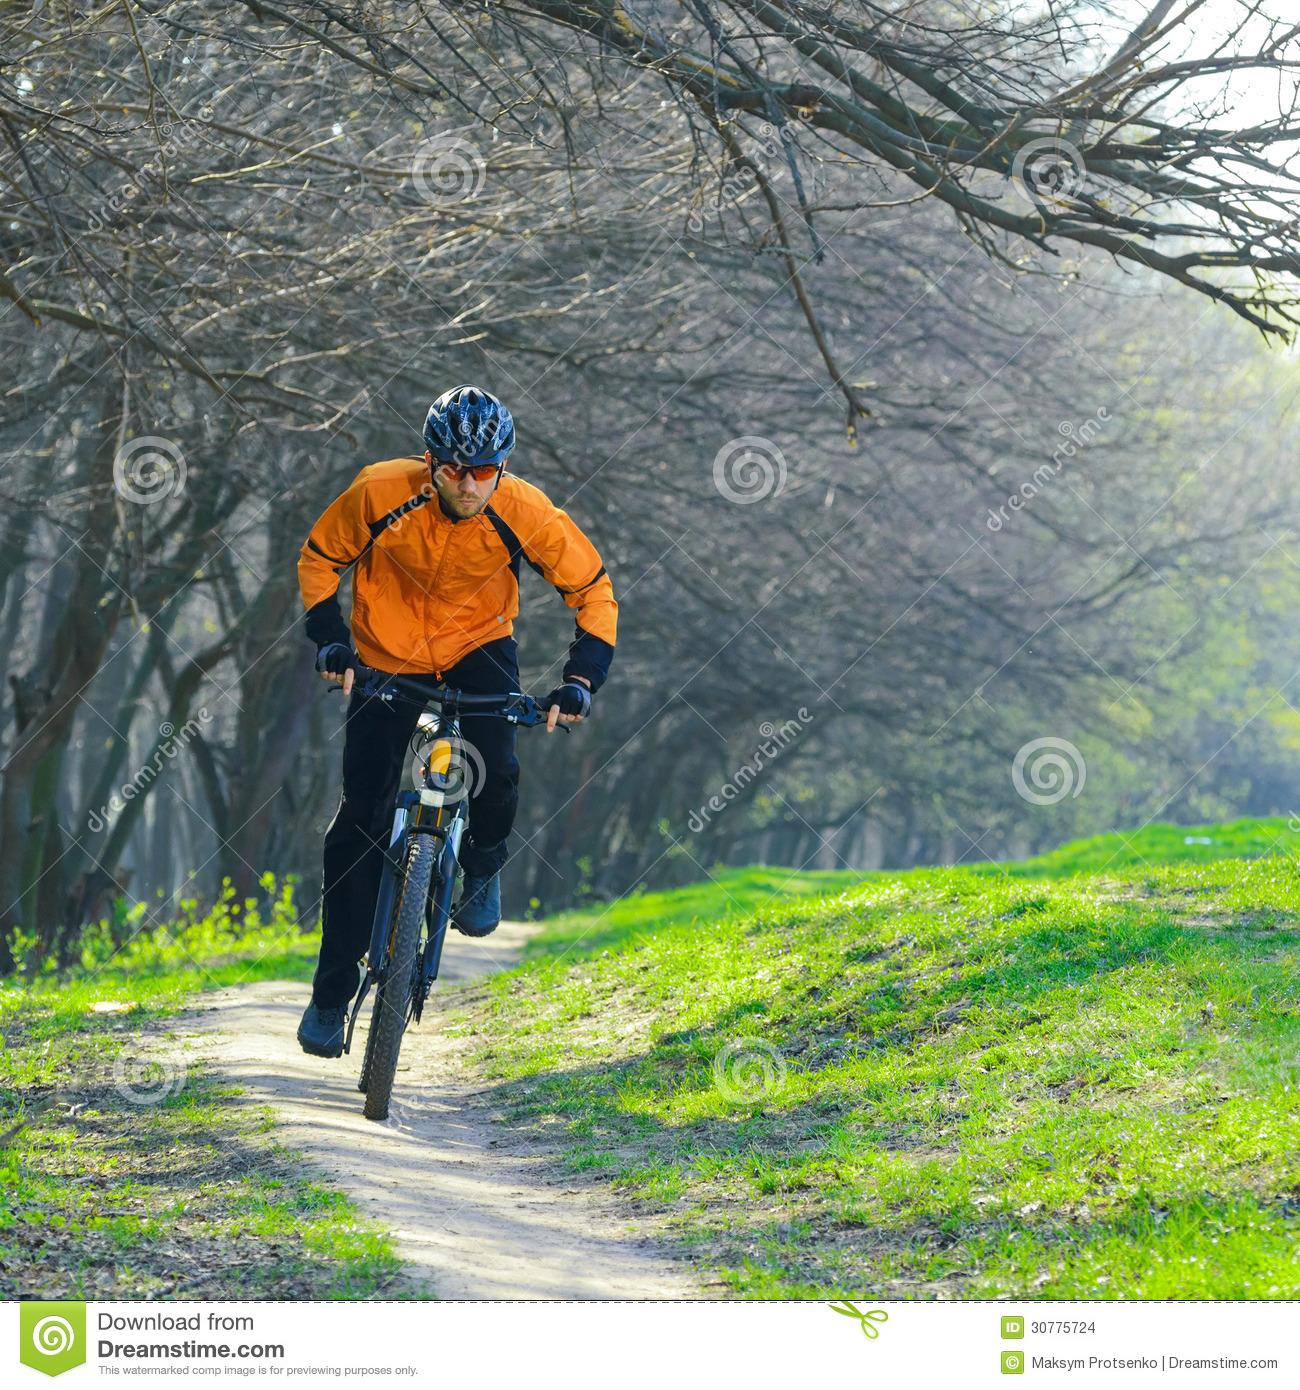 Trail Riding Bike Clipart.